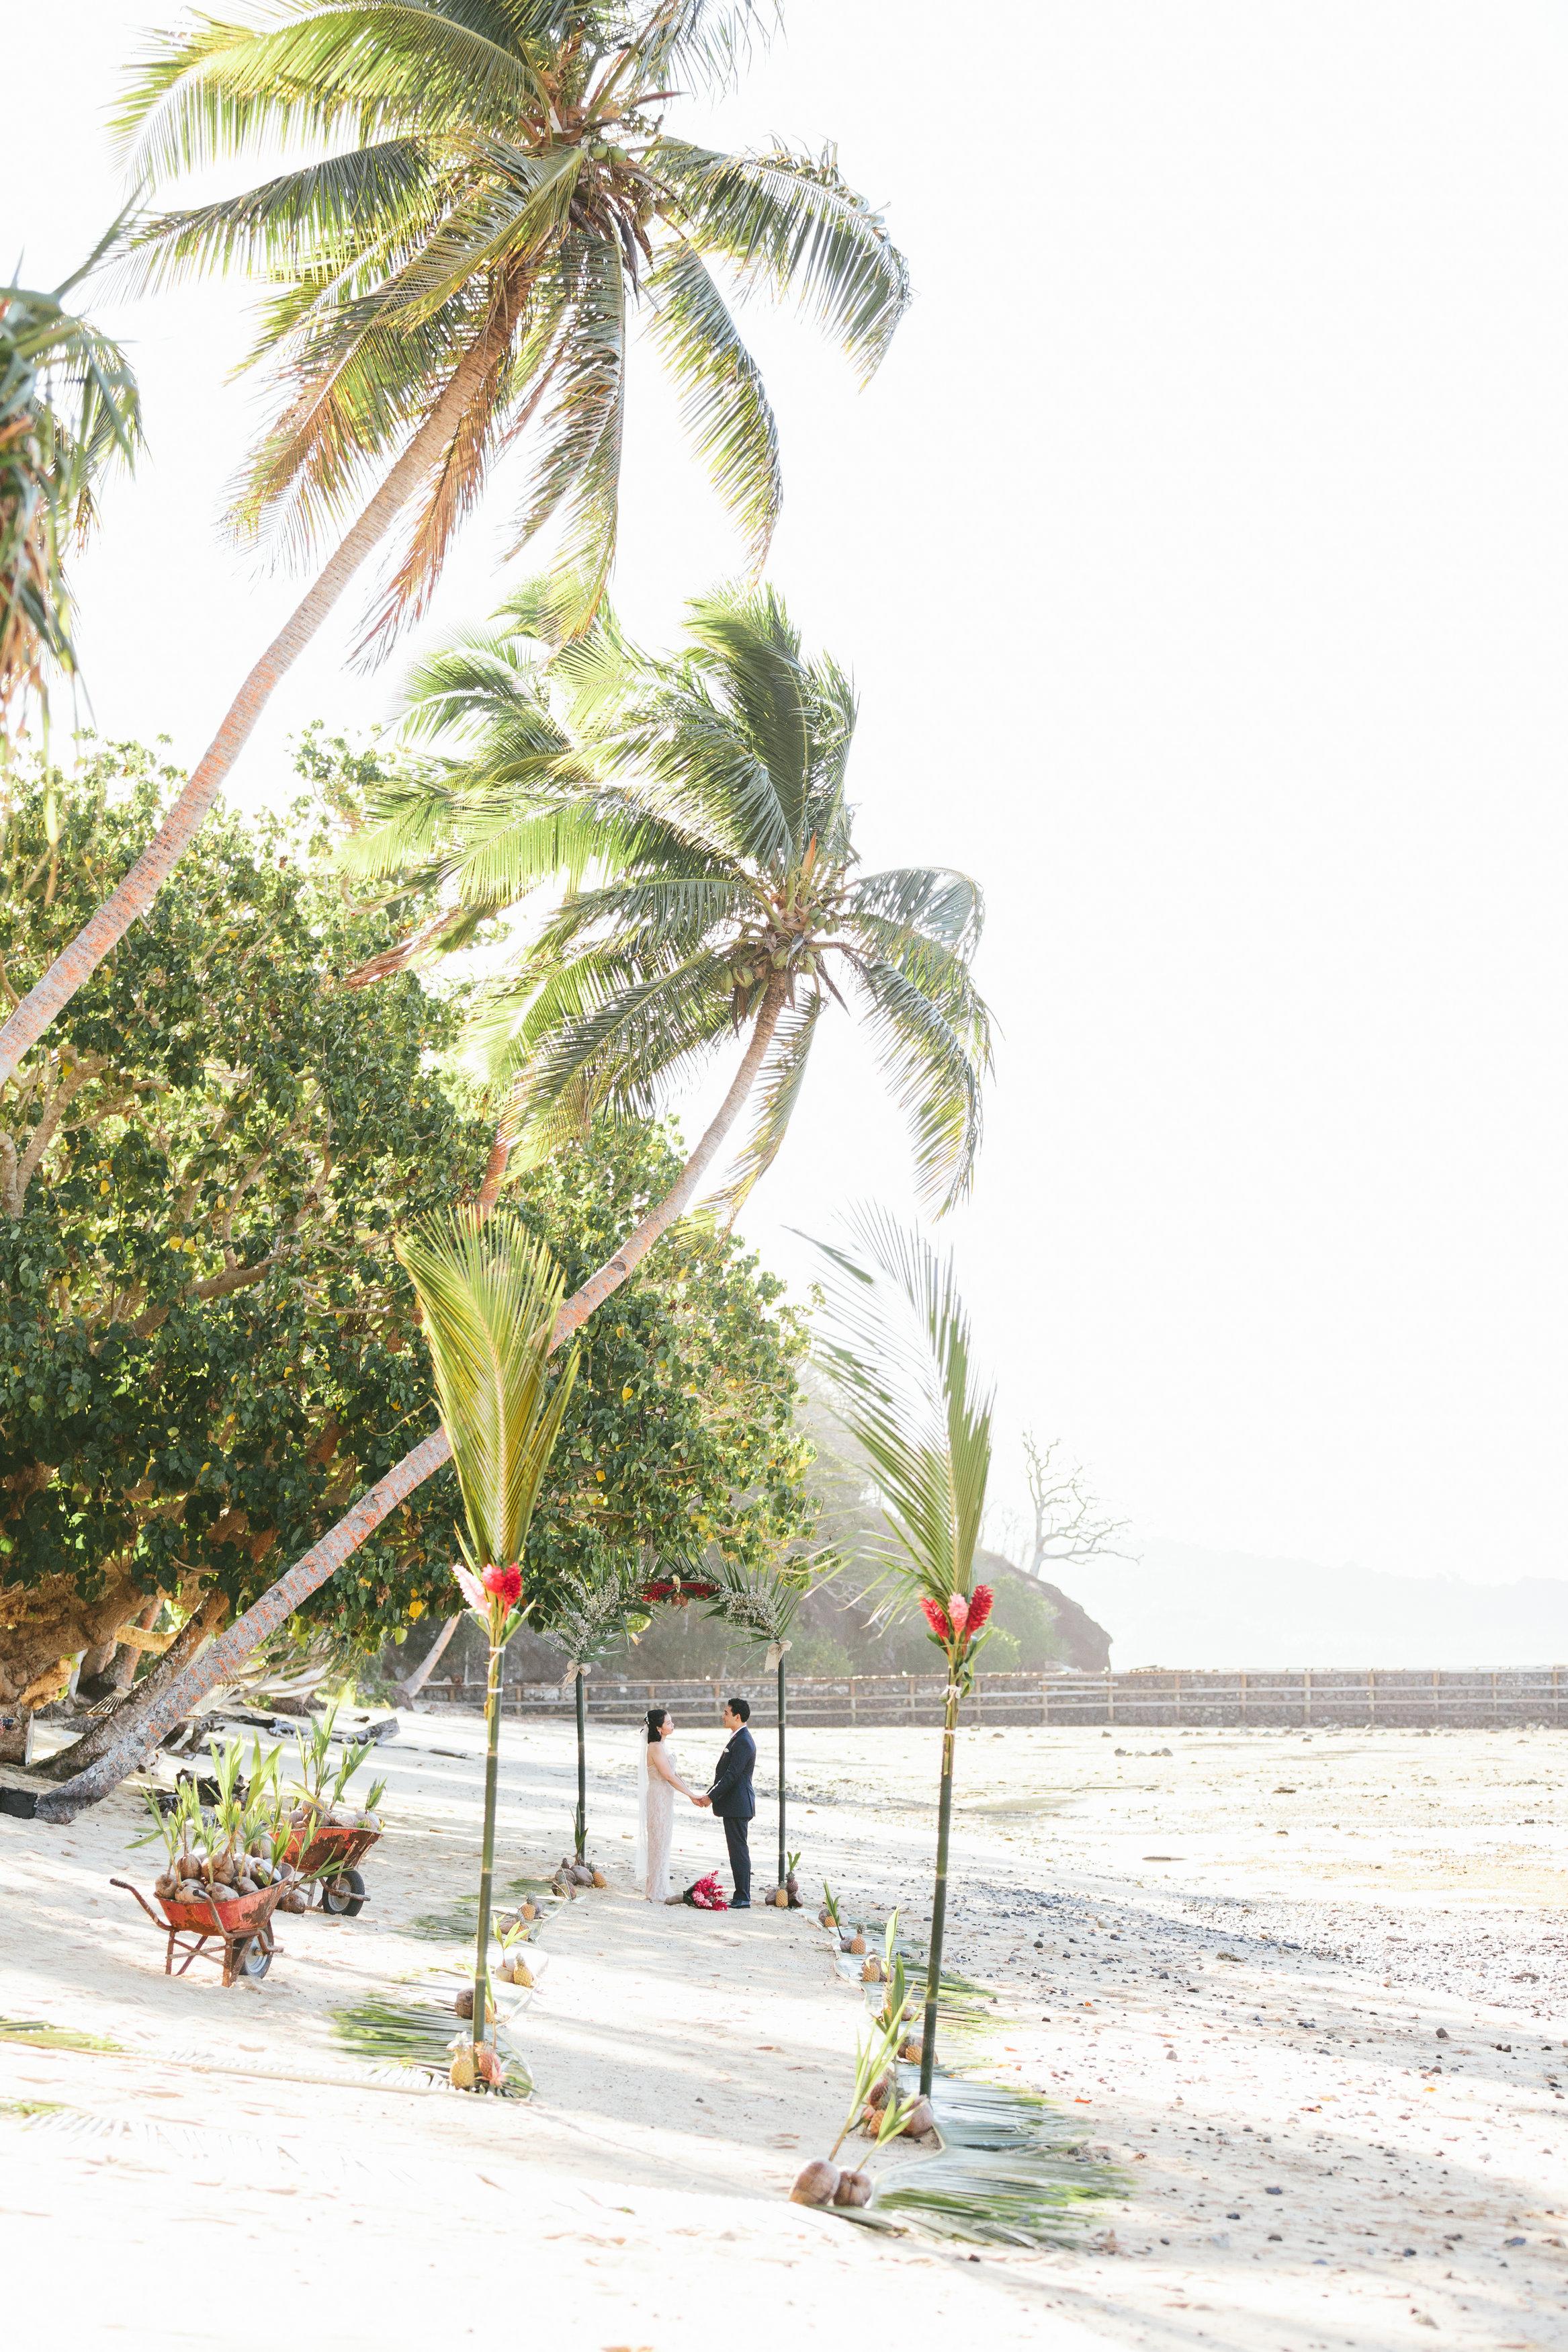 Fiji Beach Wedding Elopement Ceremony - The Remote Resort Fiji Islands